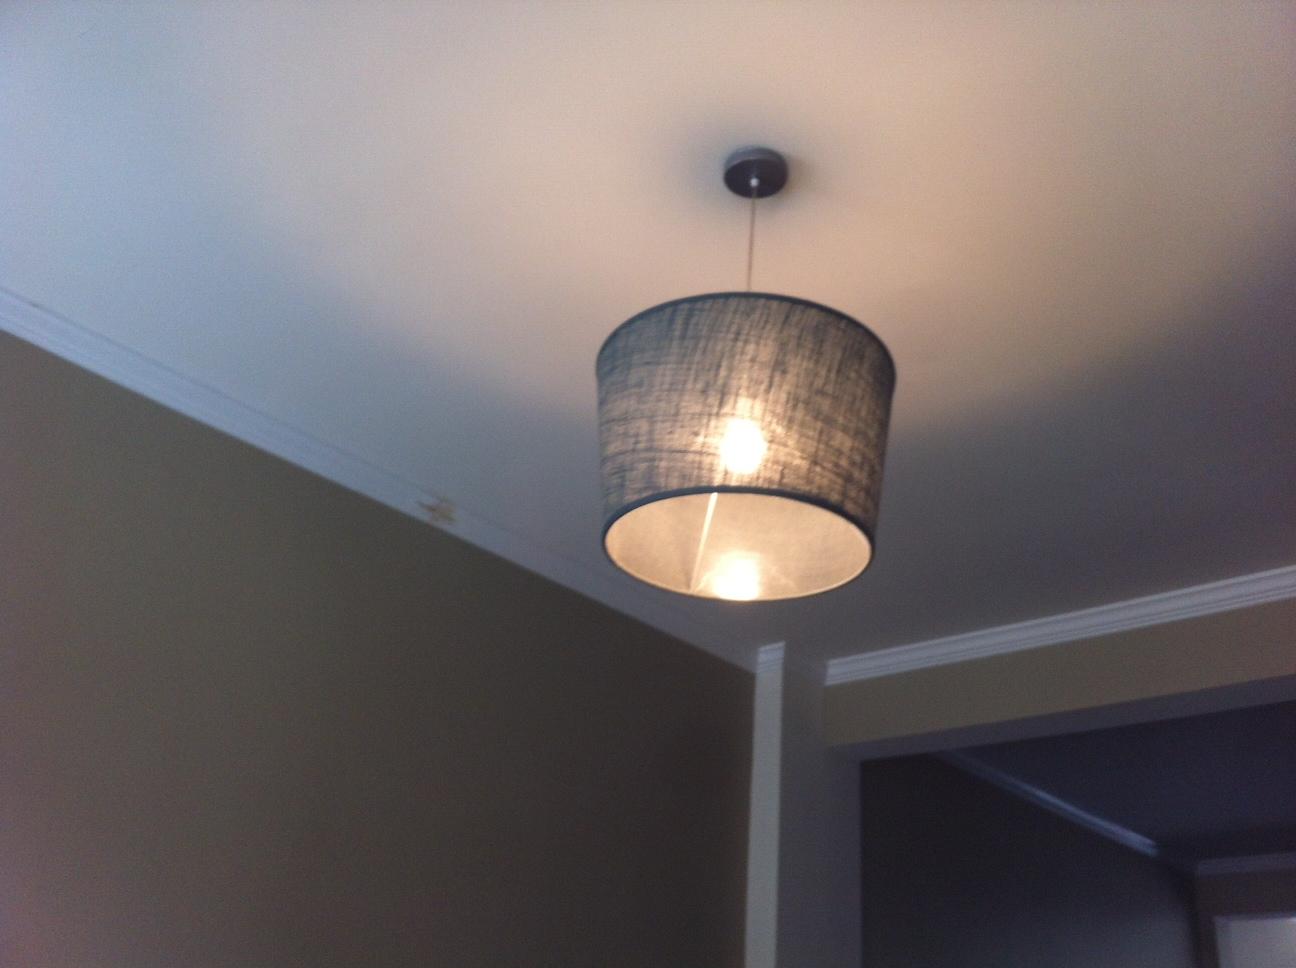 House Of Thrifty Decor: Restoration Hardware Light Knock